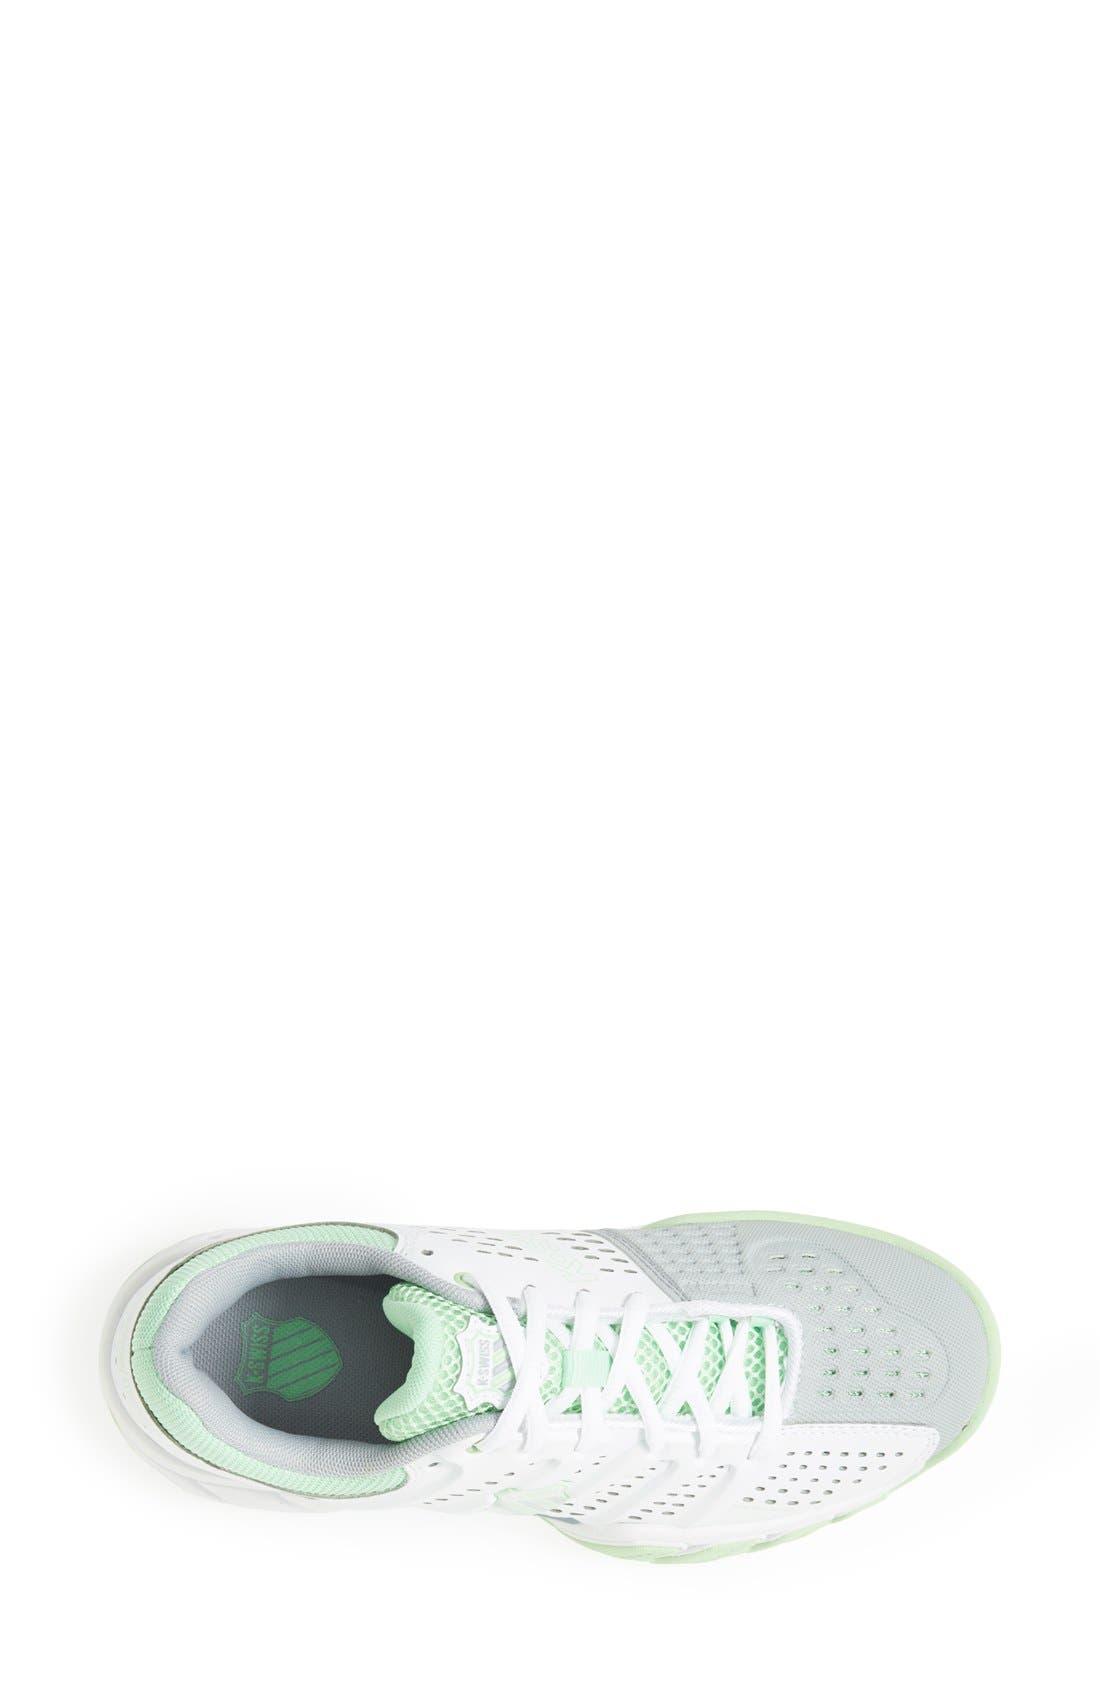 Alternate Image 3  - K-Swiss 'Big Shot Light' Tennis Shoe (Women)